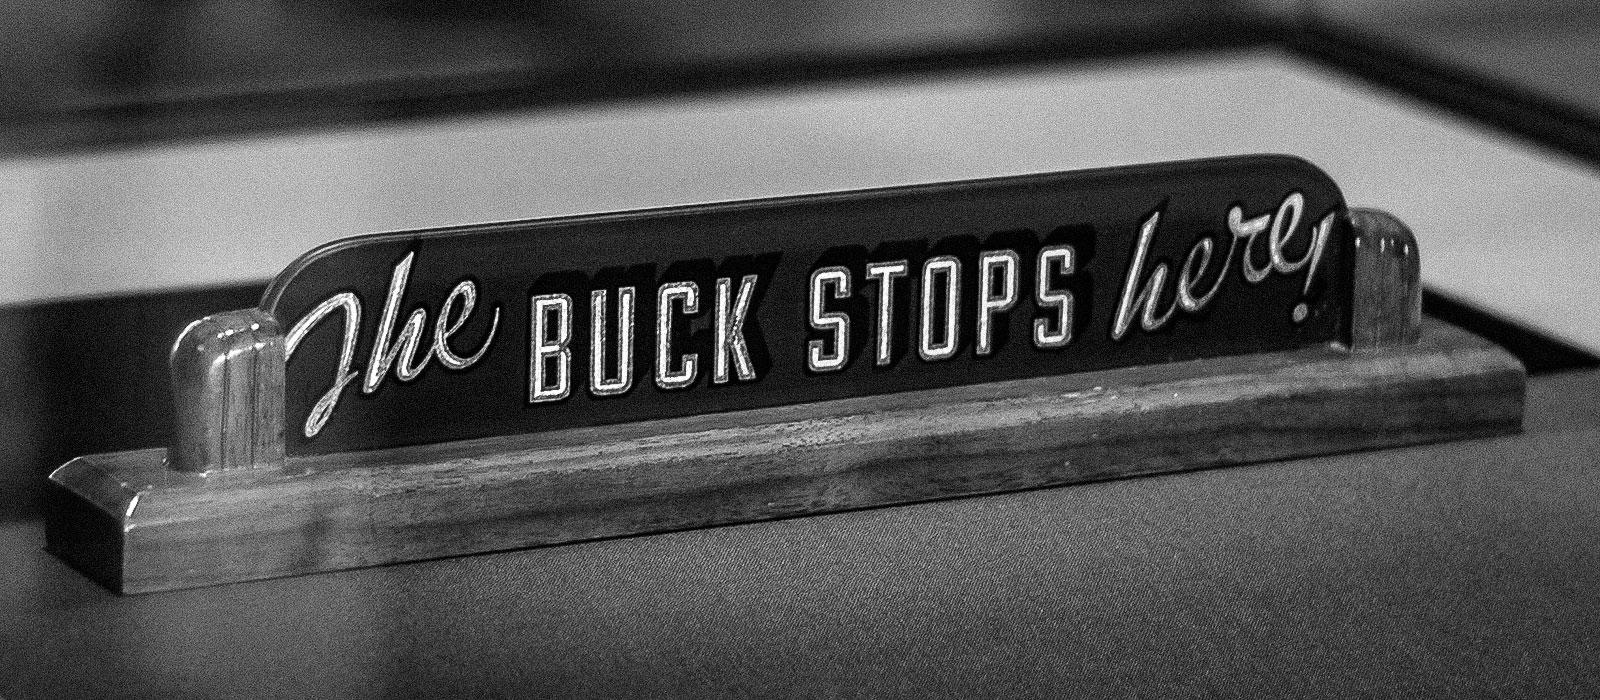 Truman - The Buck Stops Here